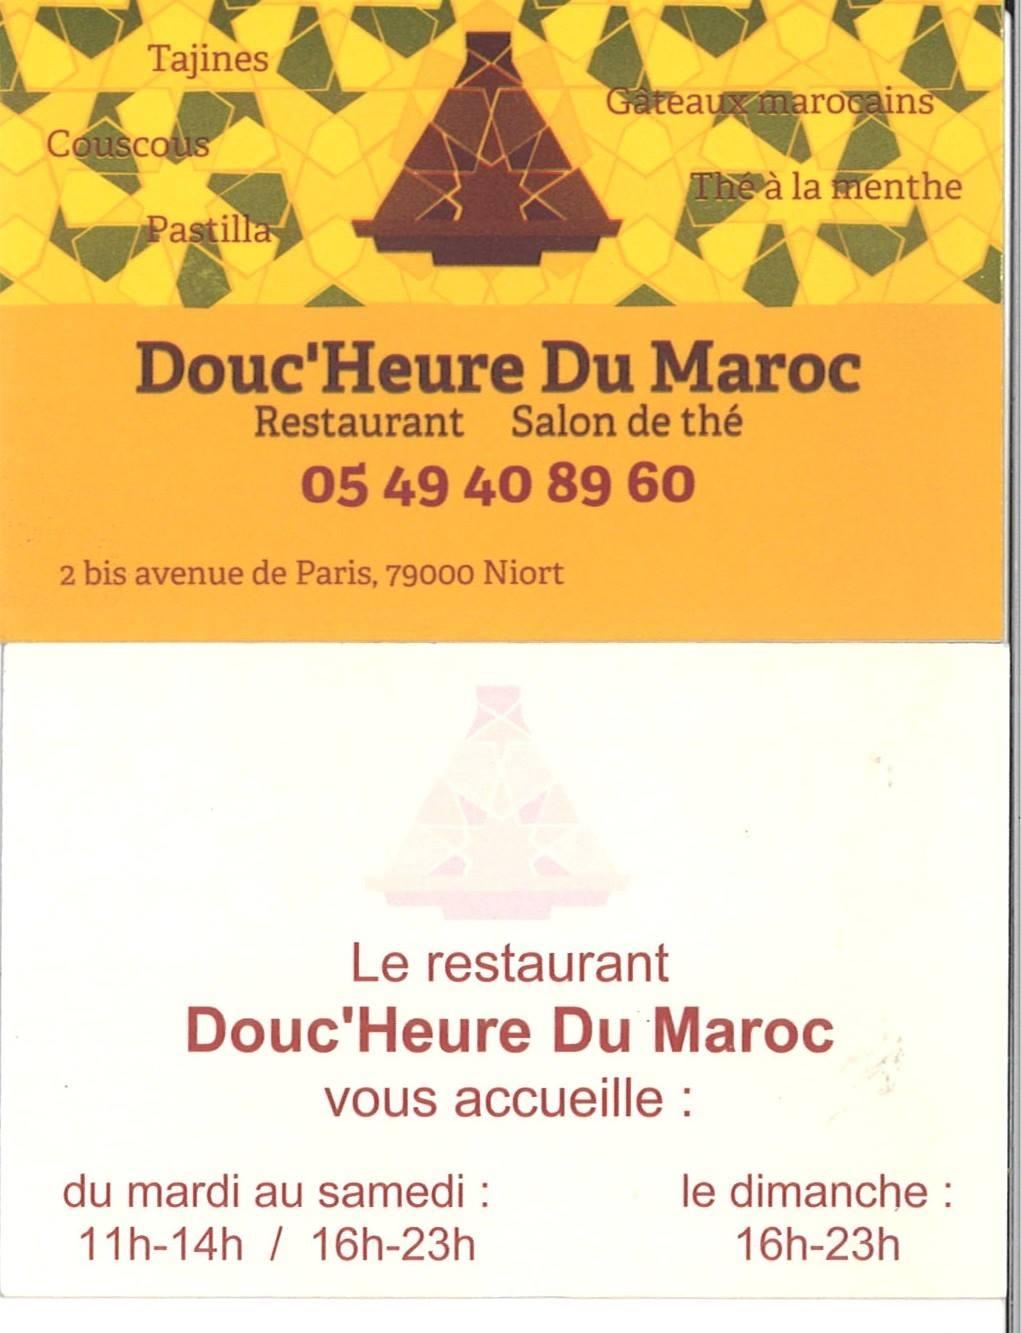 Douc'Heure Du Maroc